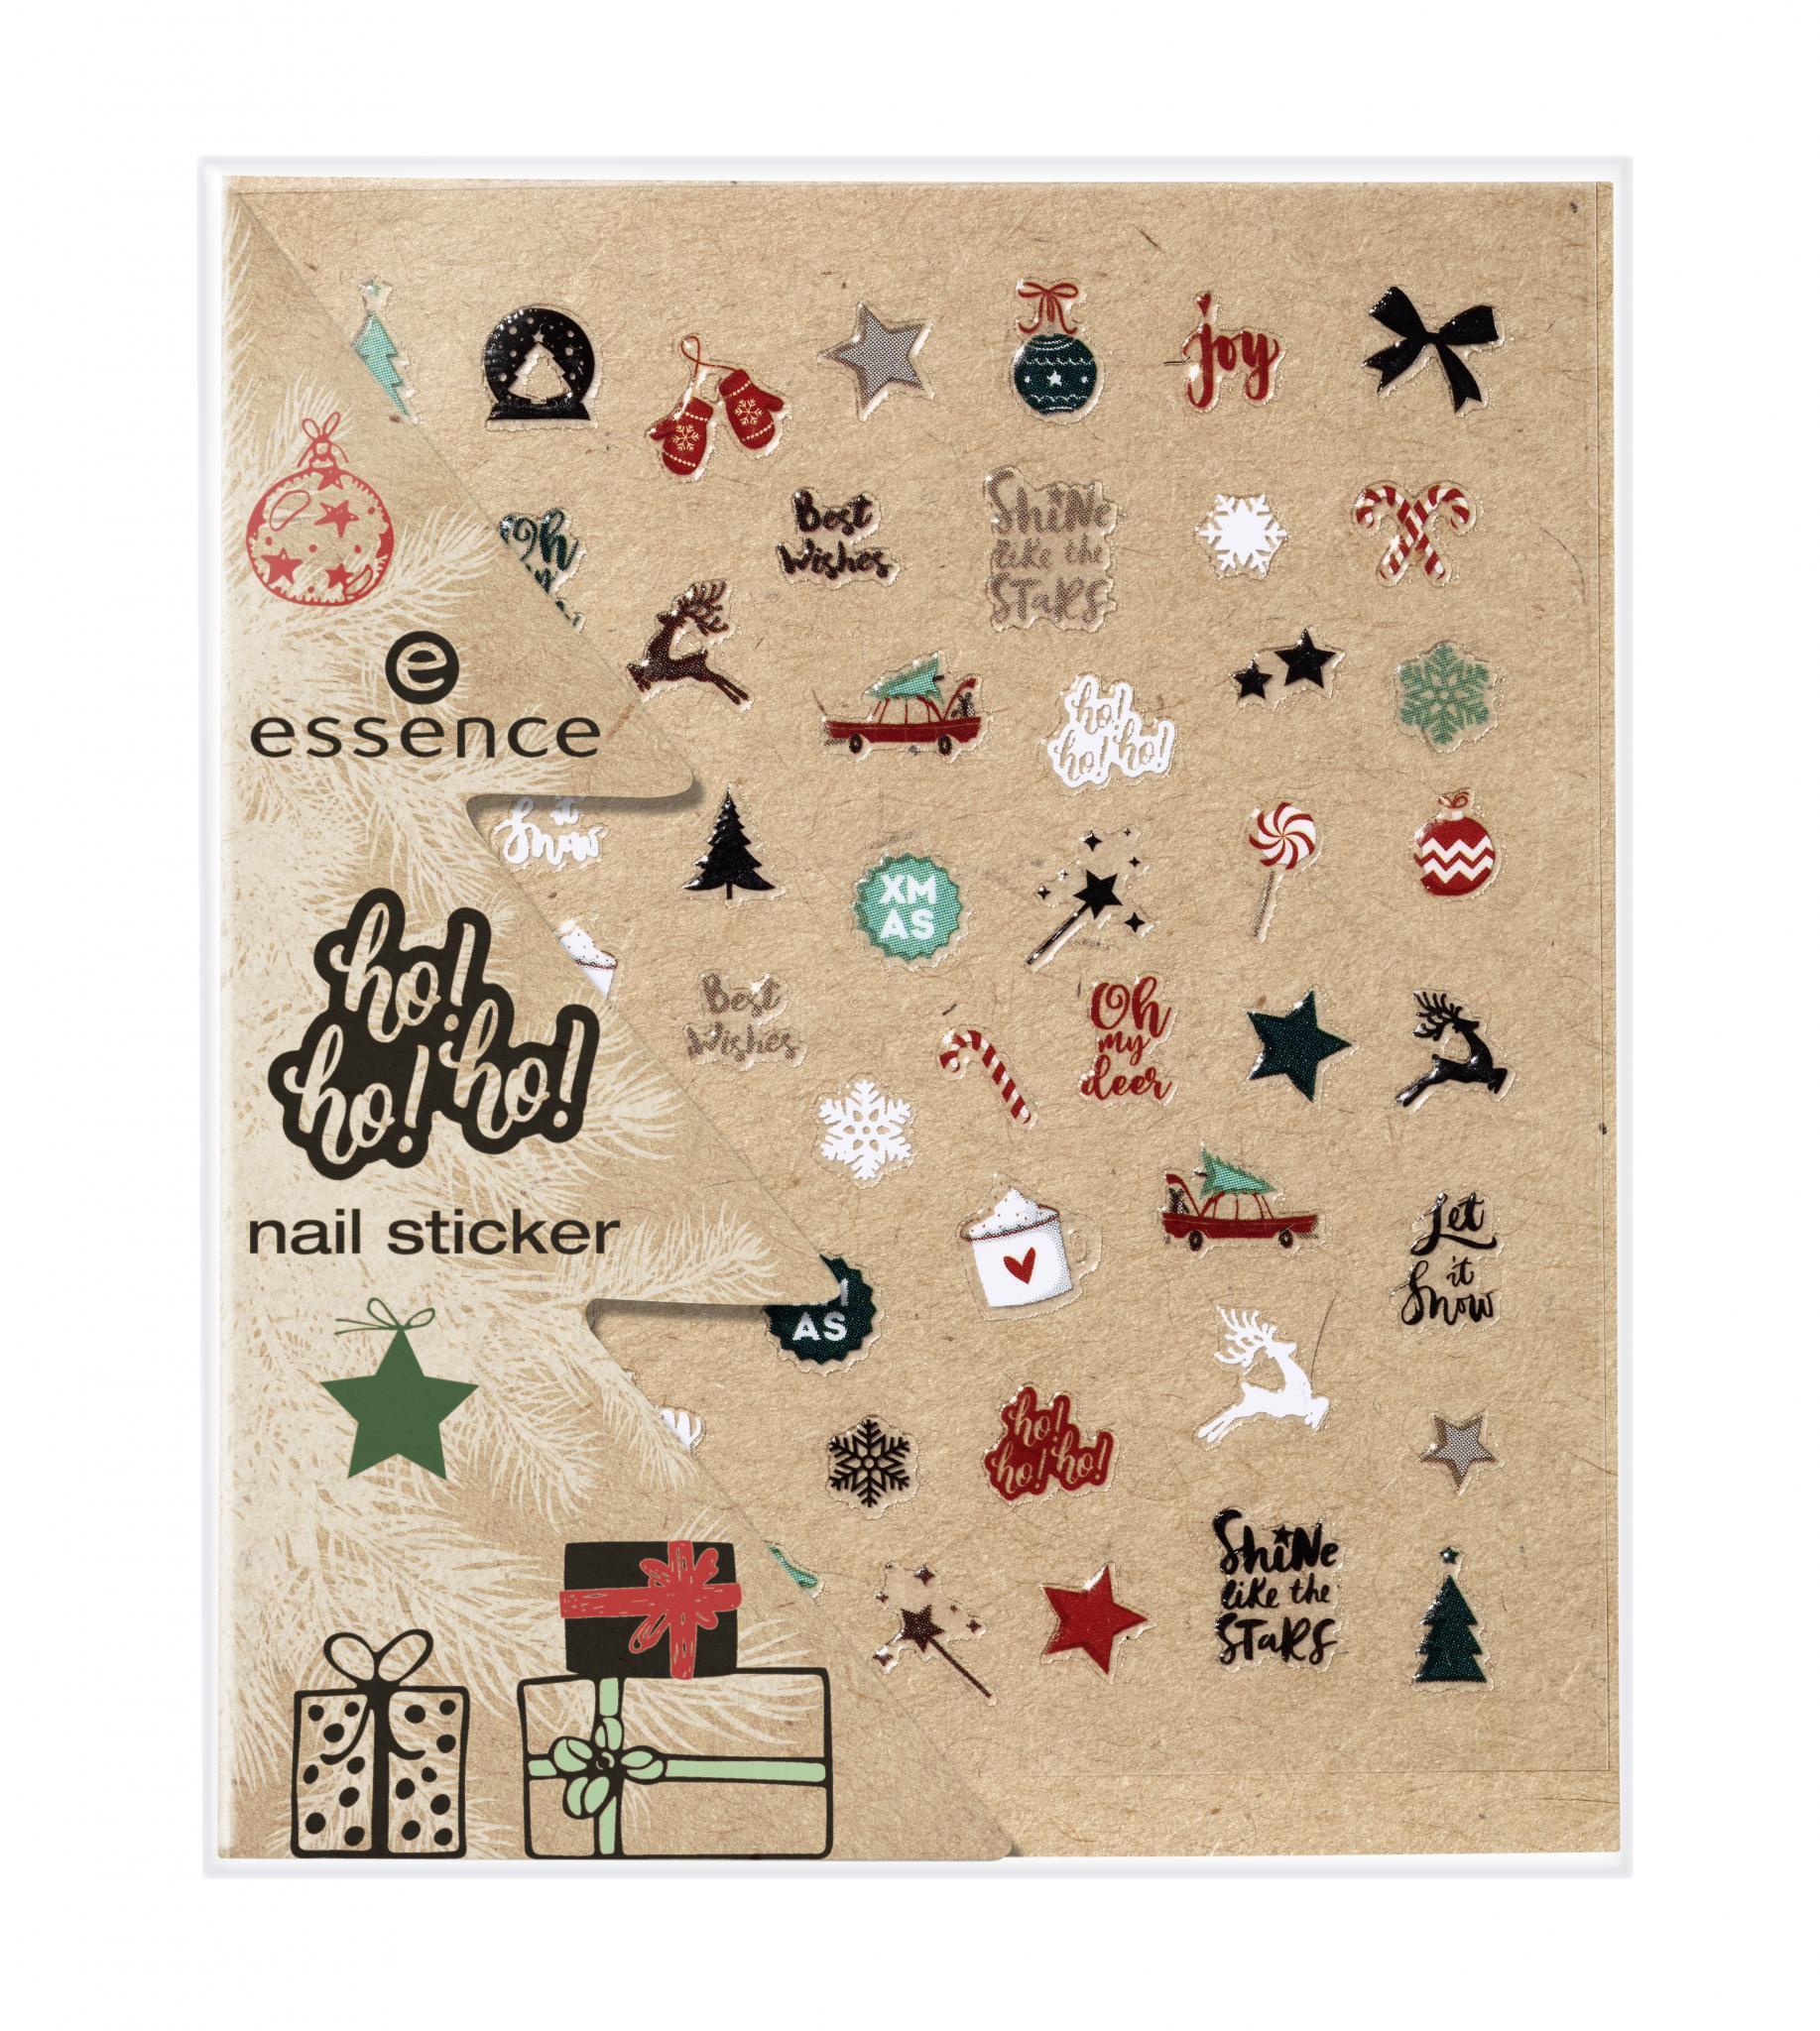 "Essence trendovska kolekcija ""ho!ho!ho!"""